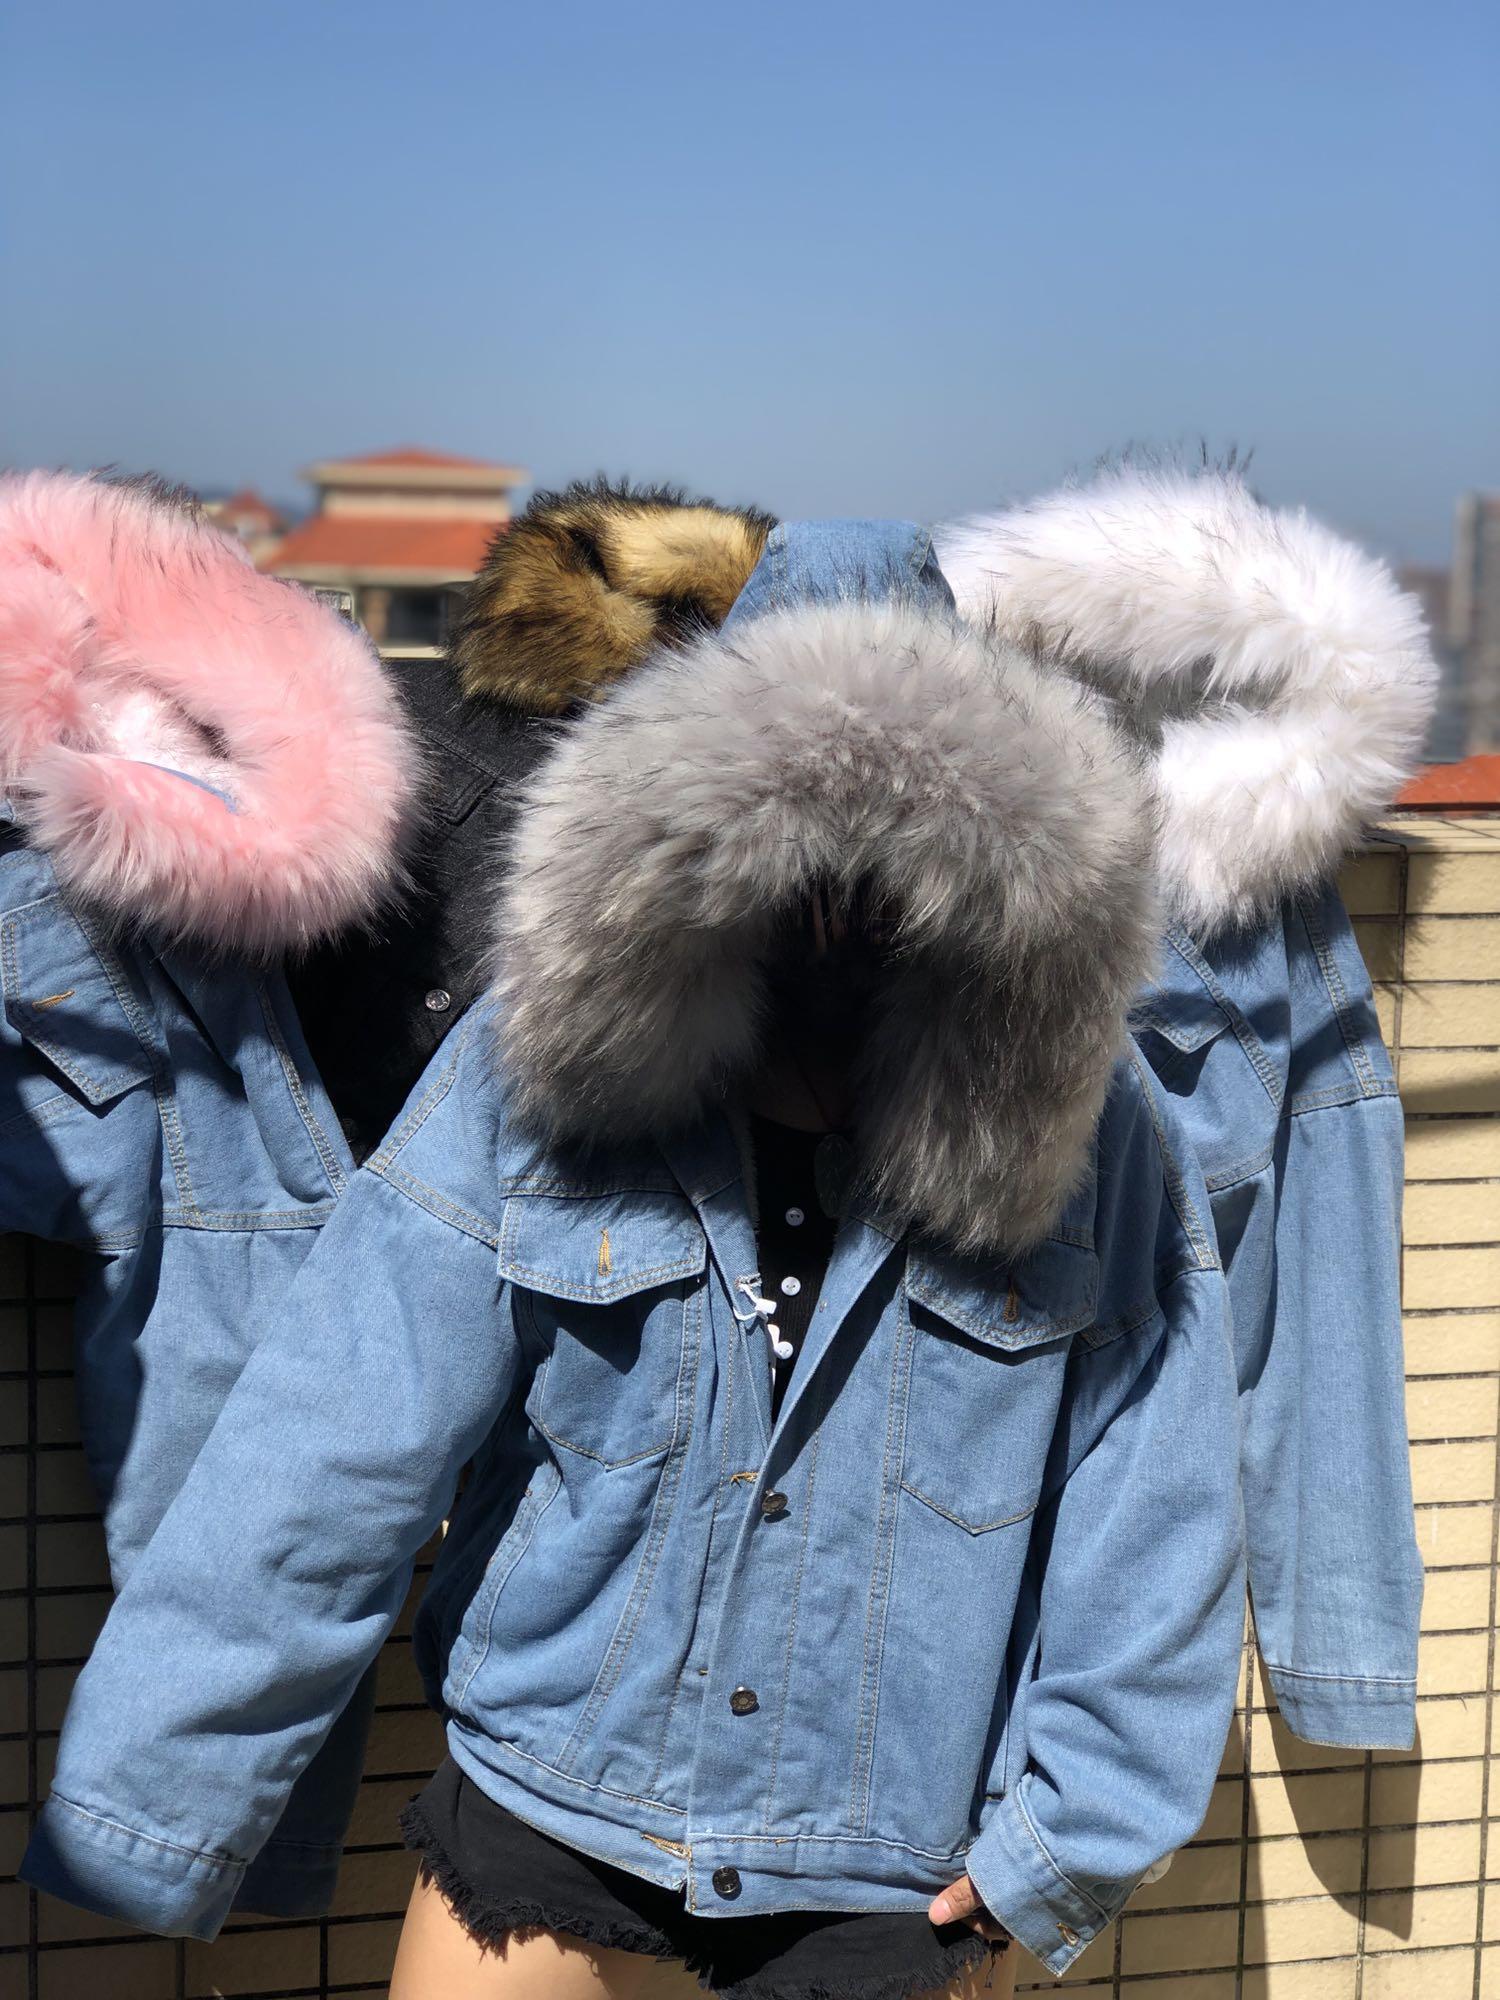 Hc16086f8328446b2a191922ef89cc0b3O LUZUZI 2019 New Warm Winter Bomber Women Winter Autumn Hooded Girls Coat Jeans Denim Jackets Basic Ladies Top Windbreaker Female